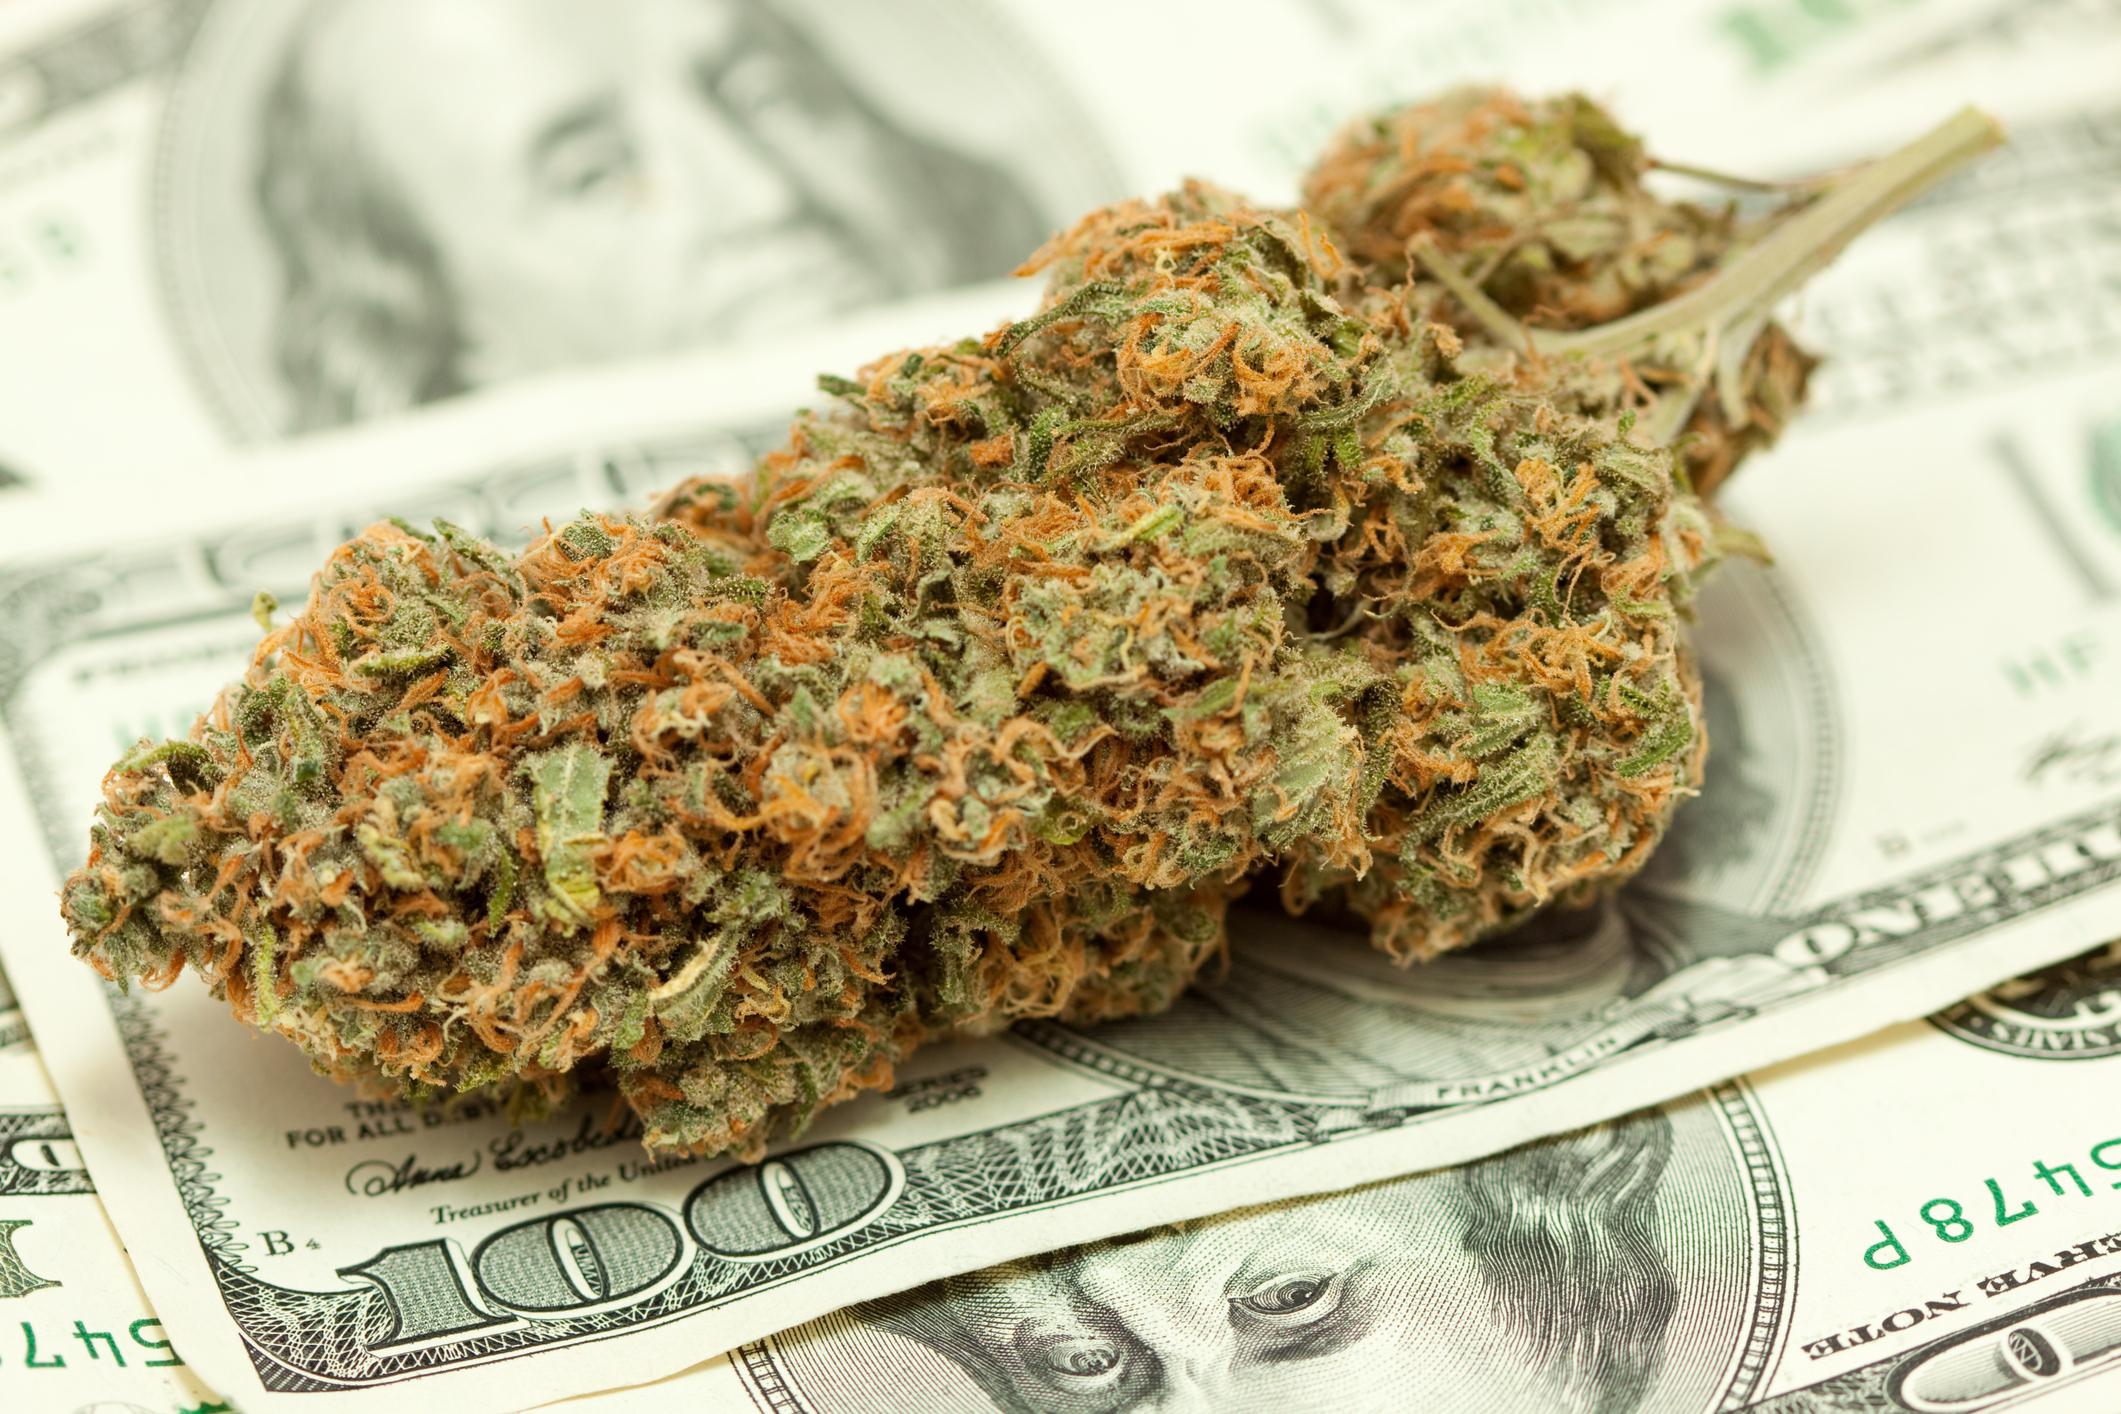 Marijuana bud sitting atop a pile of cash